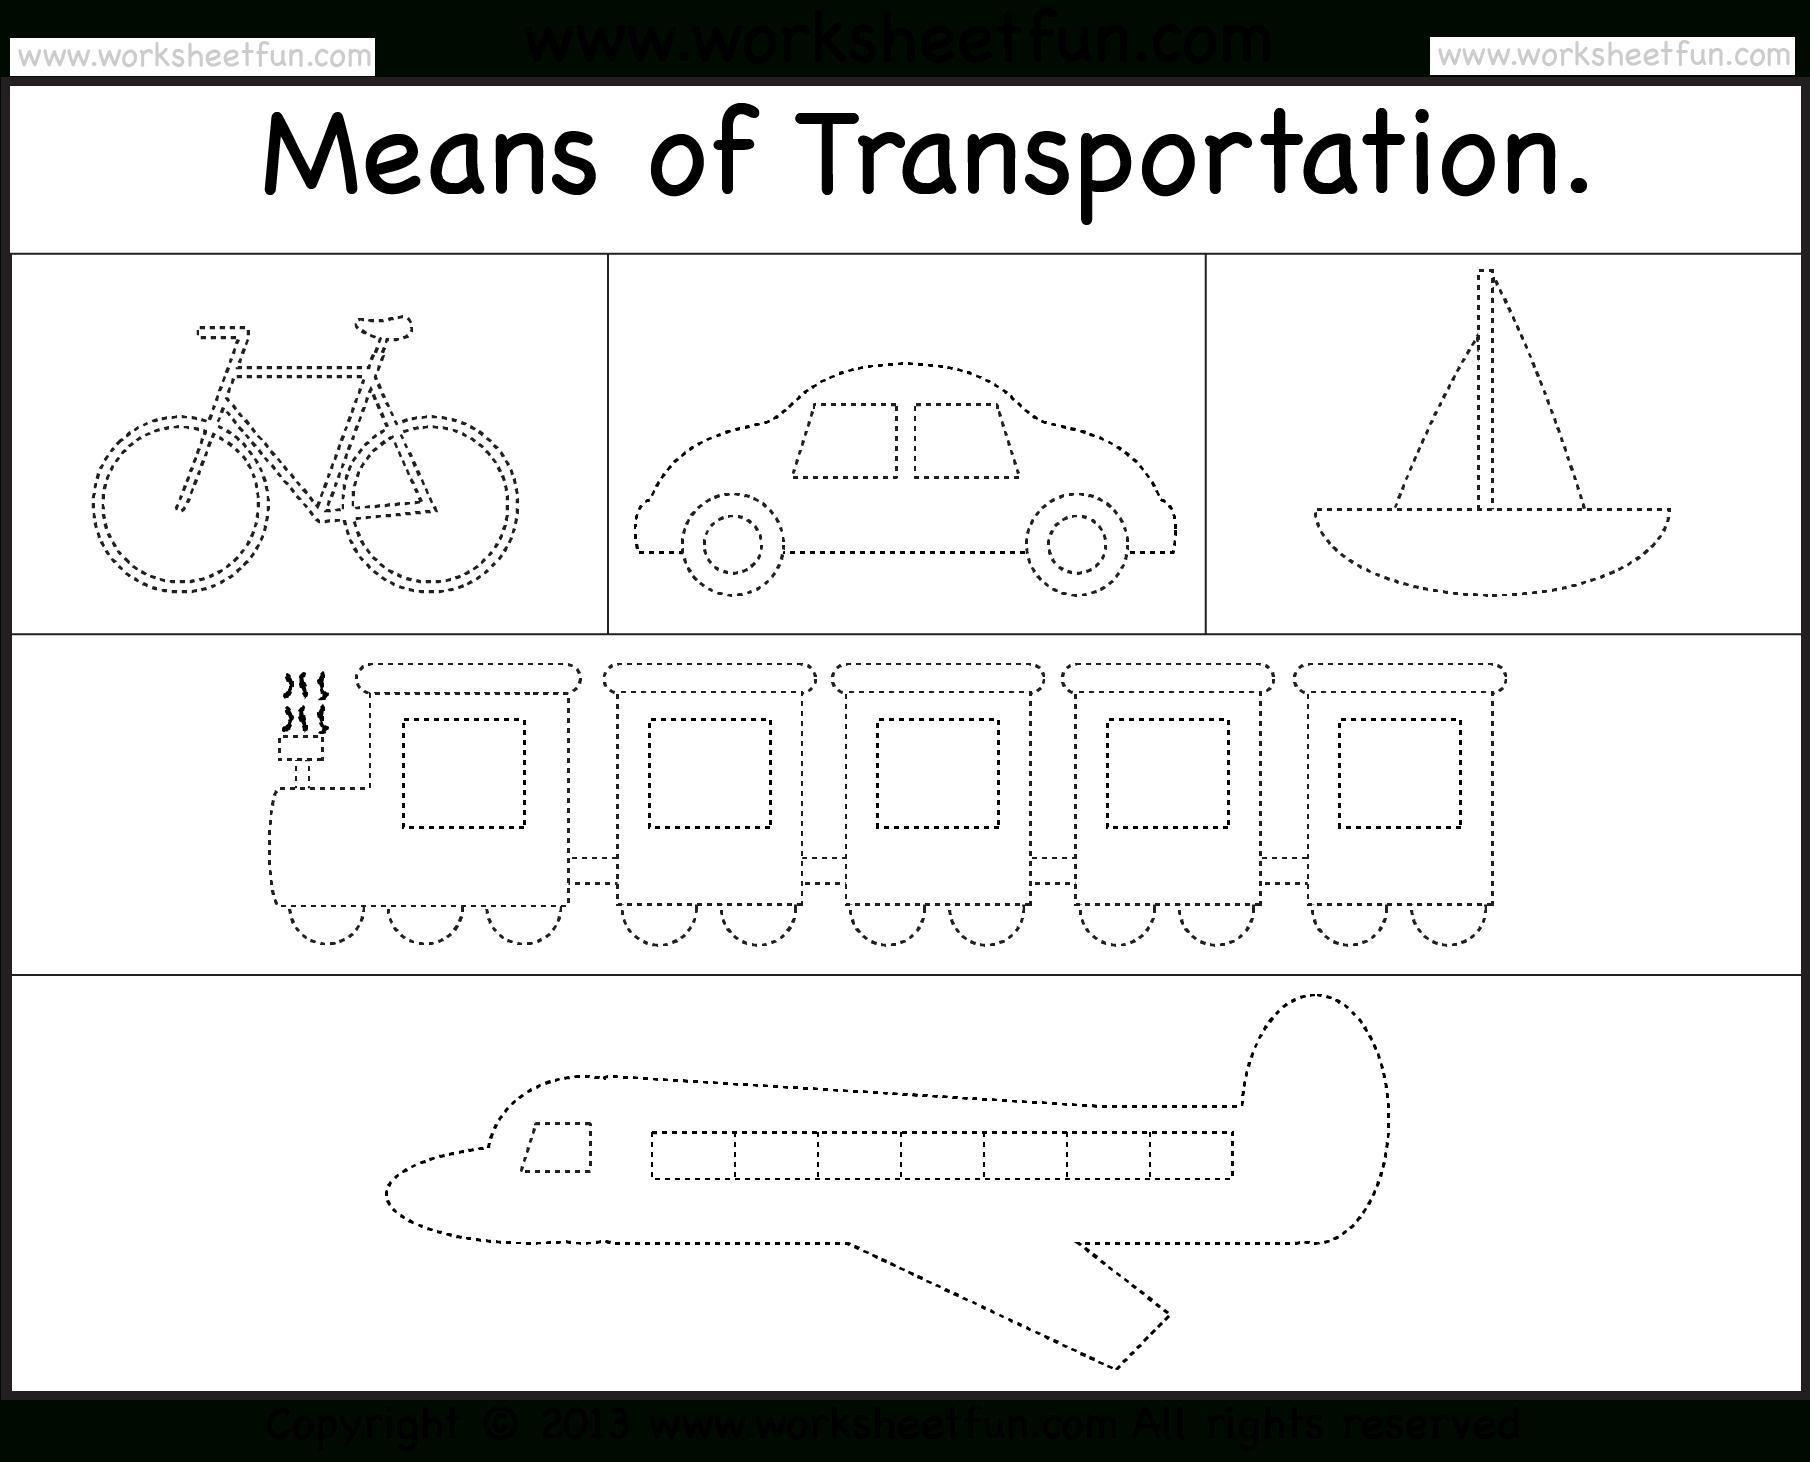 Modes Of Transportation / Free Printable Worksheets – Worksheetfun - Free Printable Transportation Worksheets For Kids